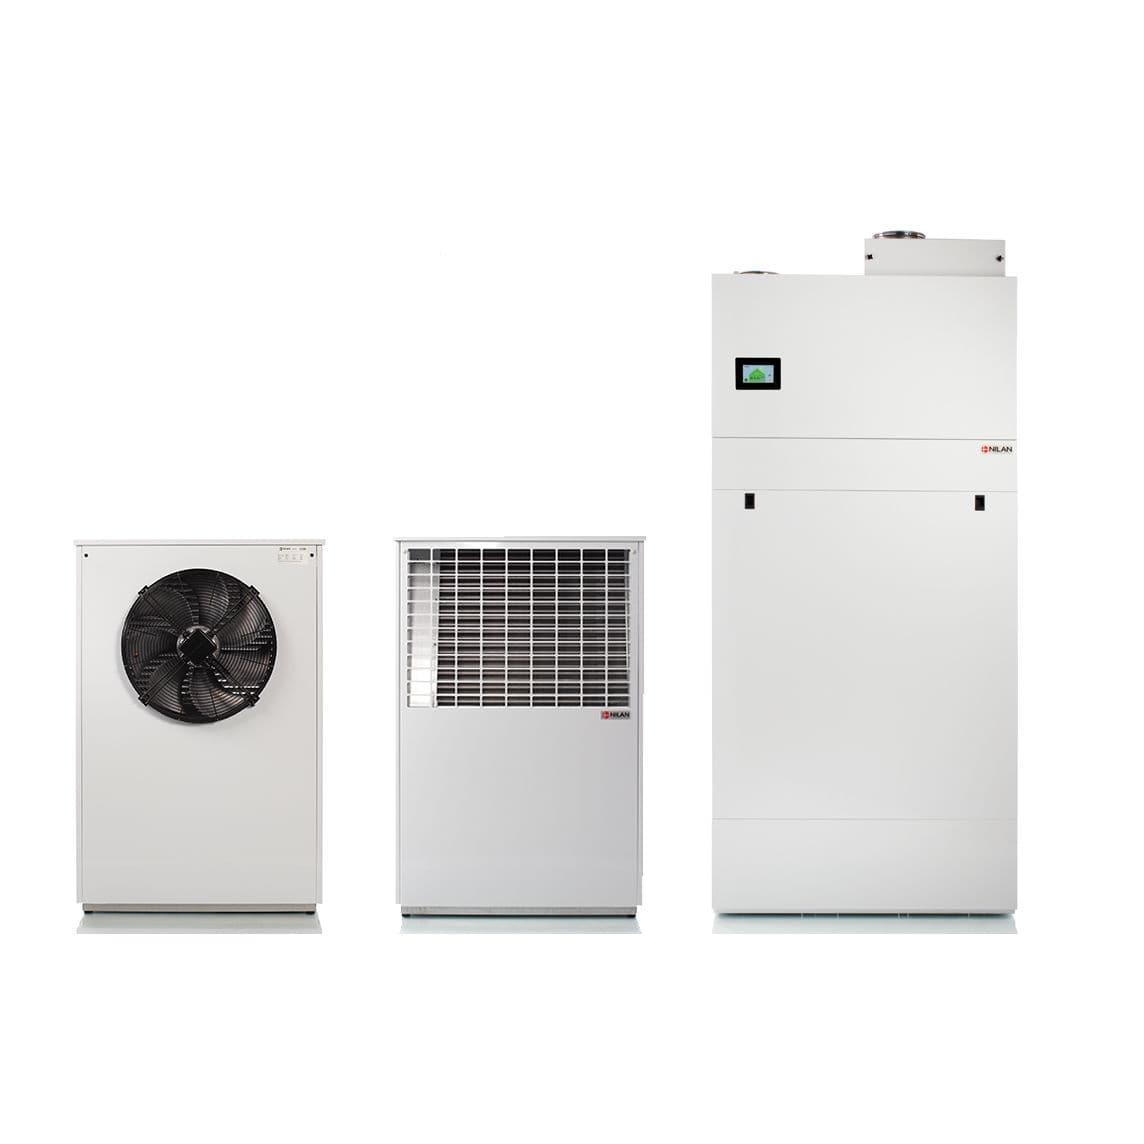 Pompa Di Calore Per Bagno pompa di calore aria-acqua - p air 9 - nilan a/s